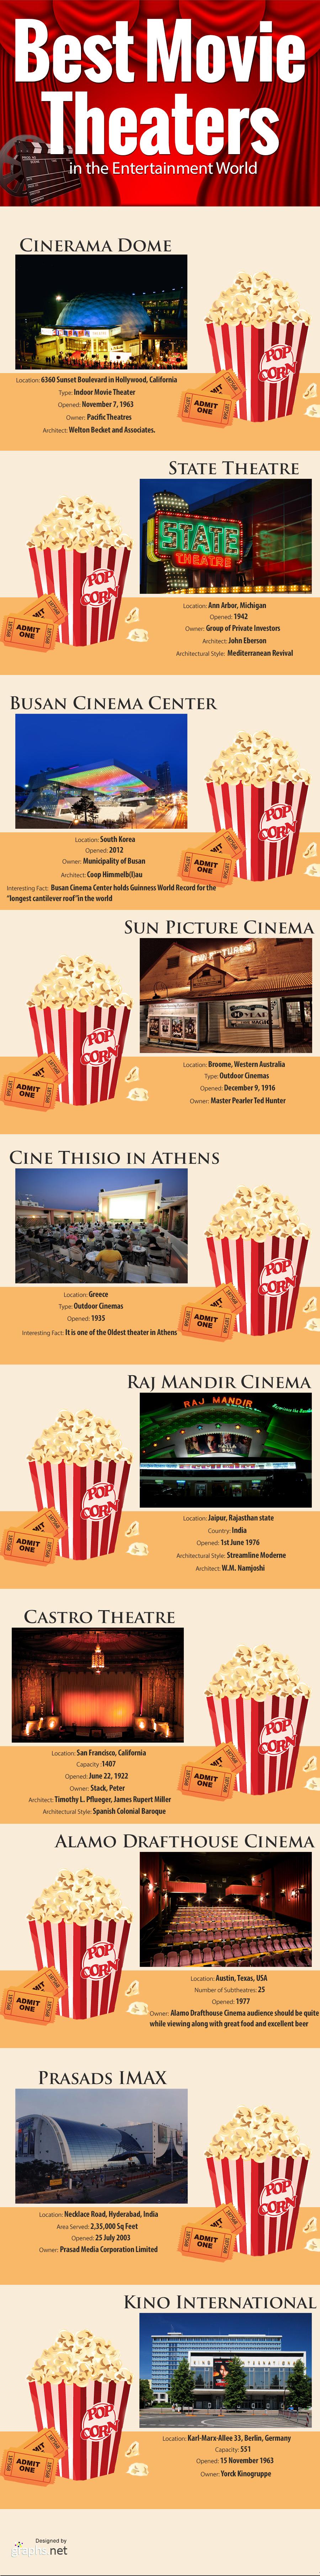 Best Movie Theatres